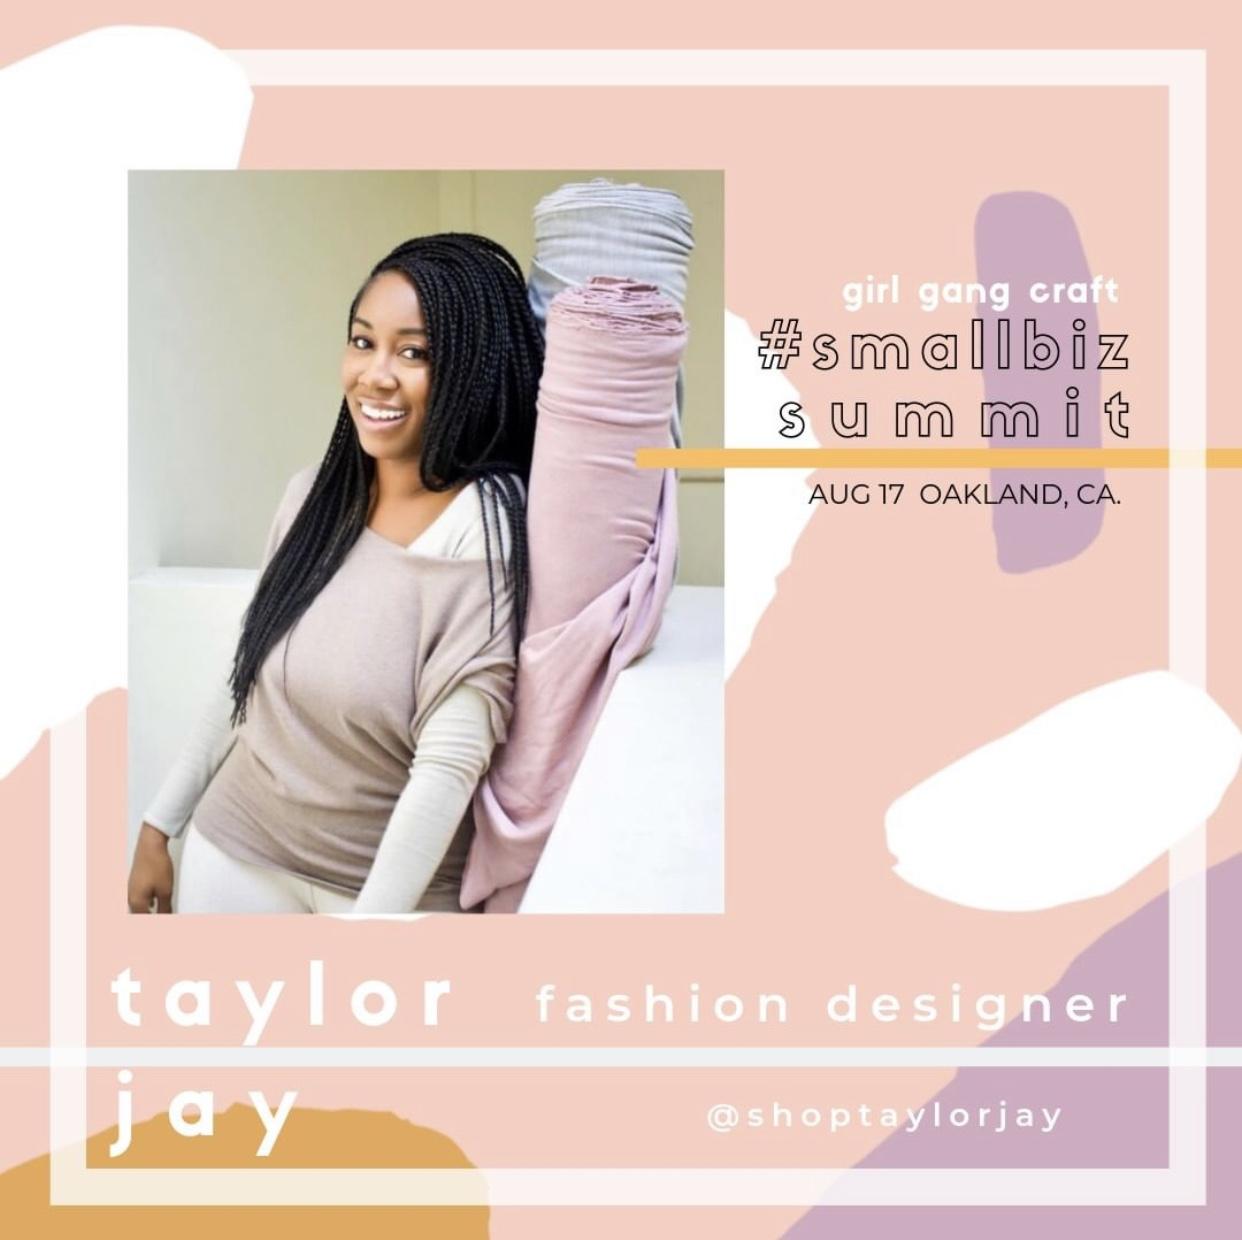 TAYLOR JAY: - FOUNDER AND CEO + PANEL@shoptaylorjay